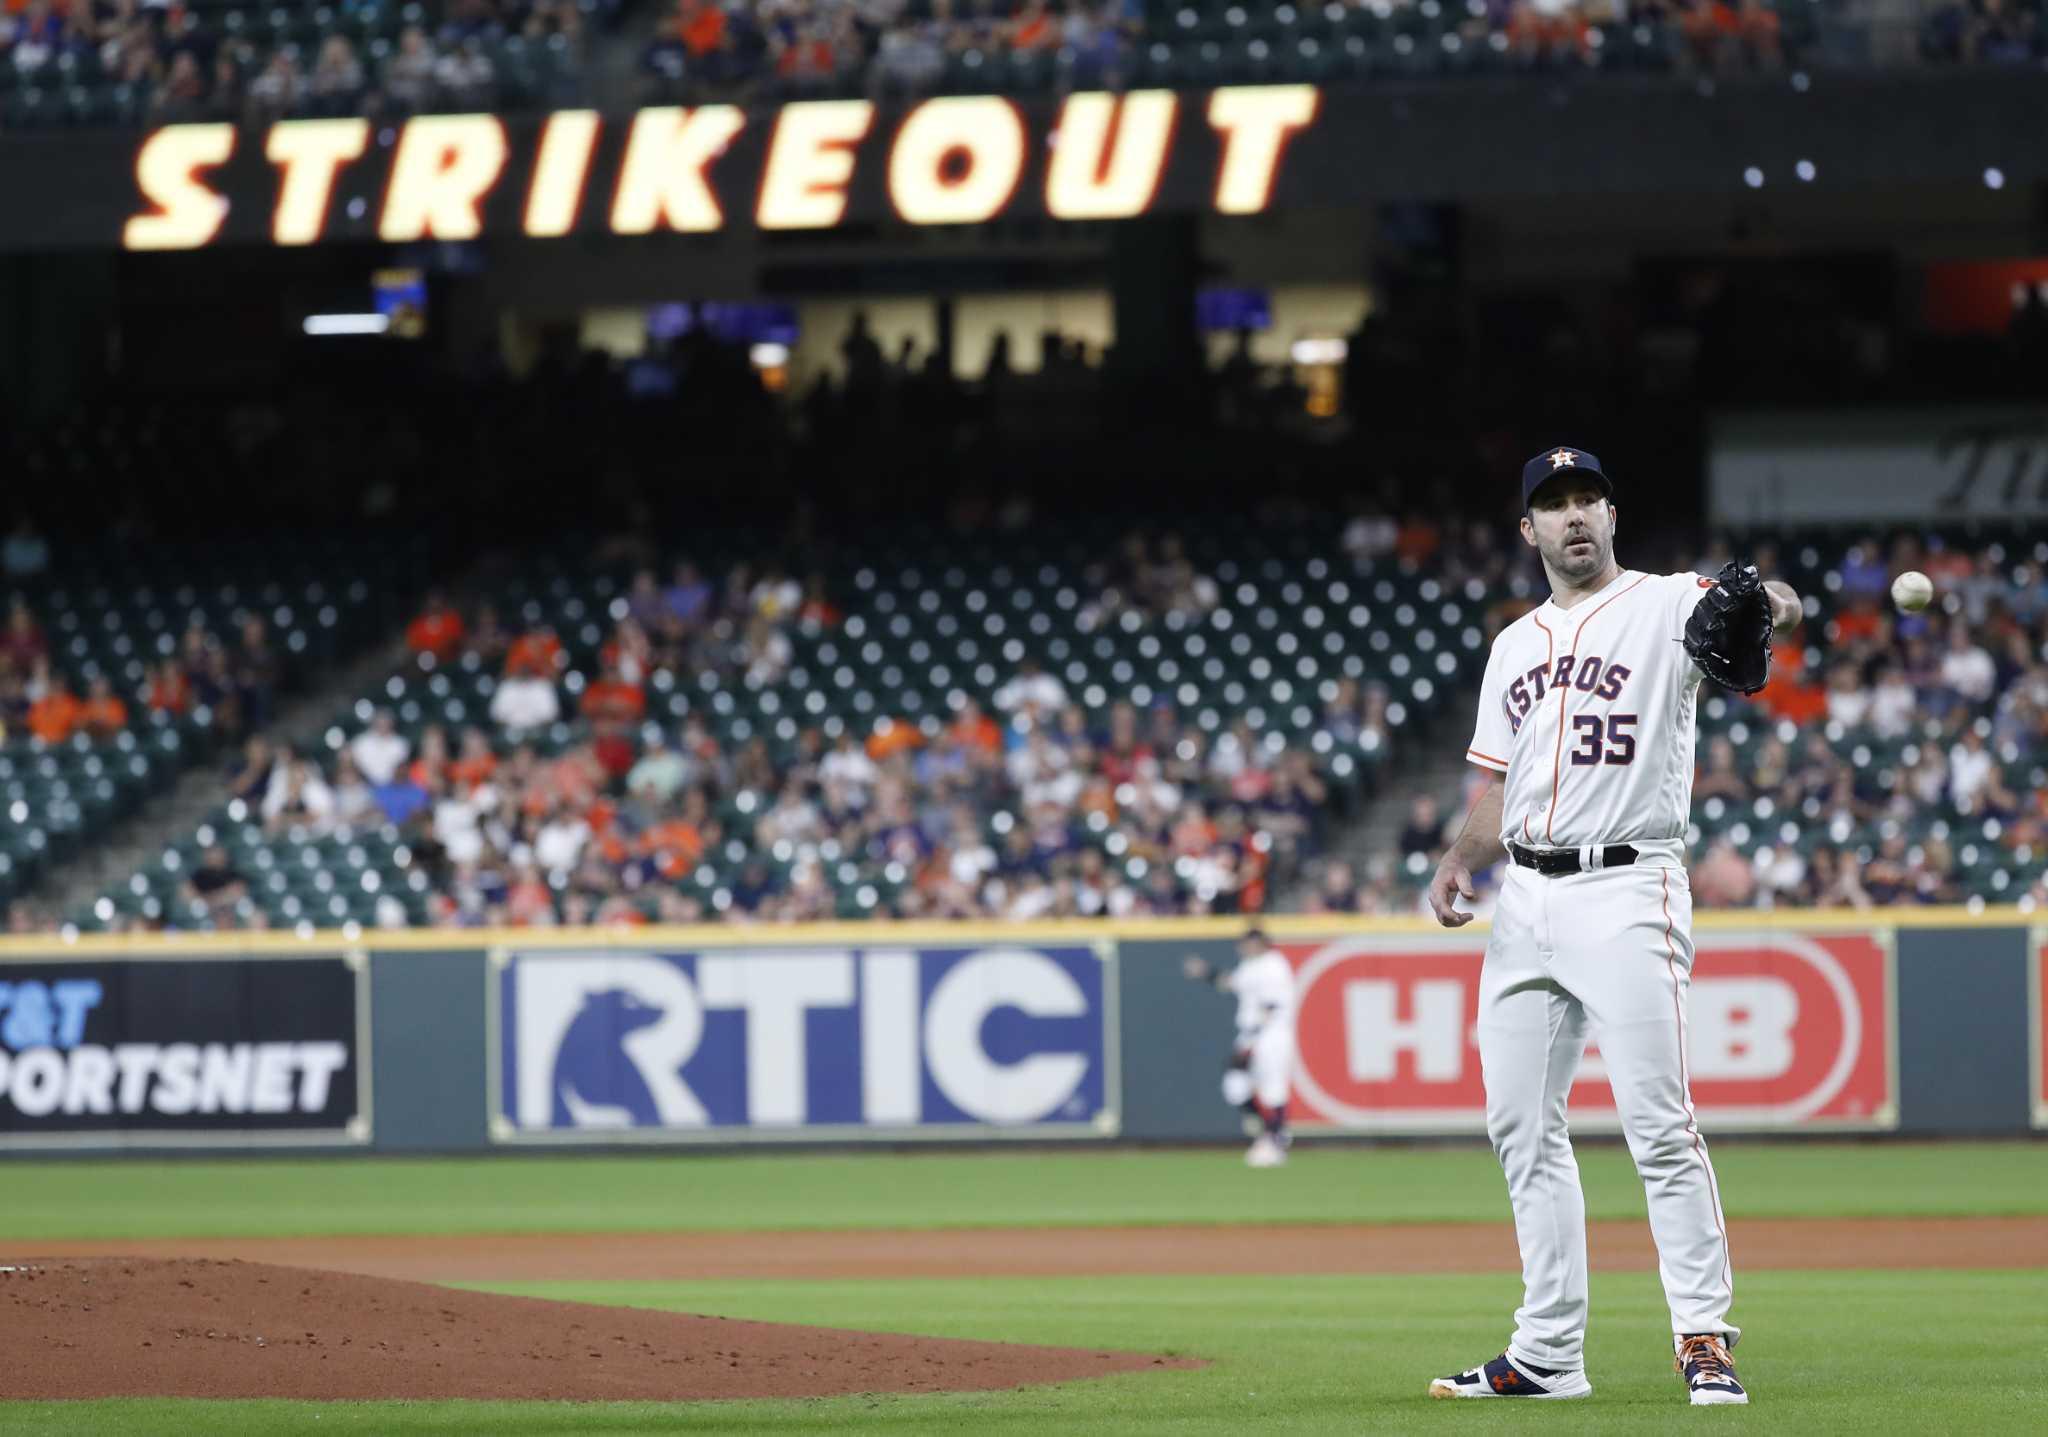 Astros' Justin Verlander joins 3,000-strikeout club